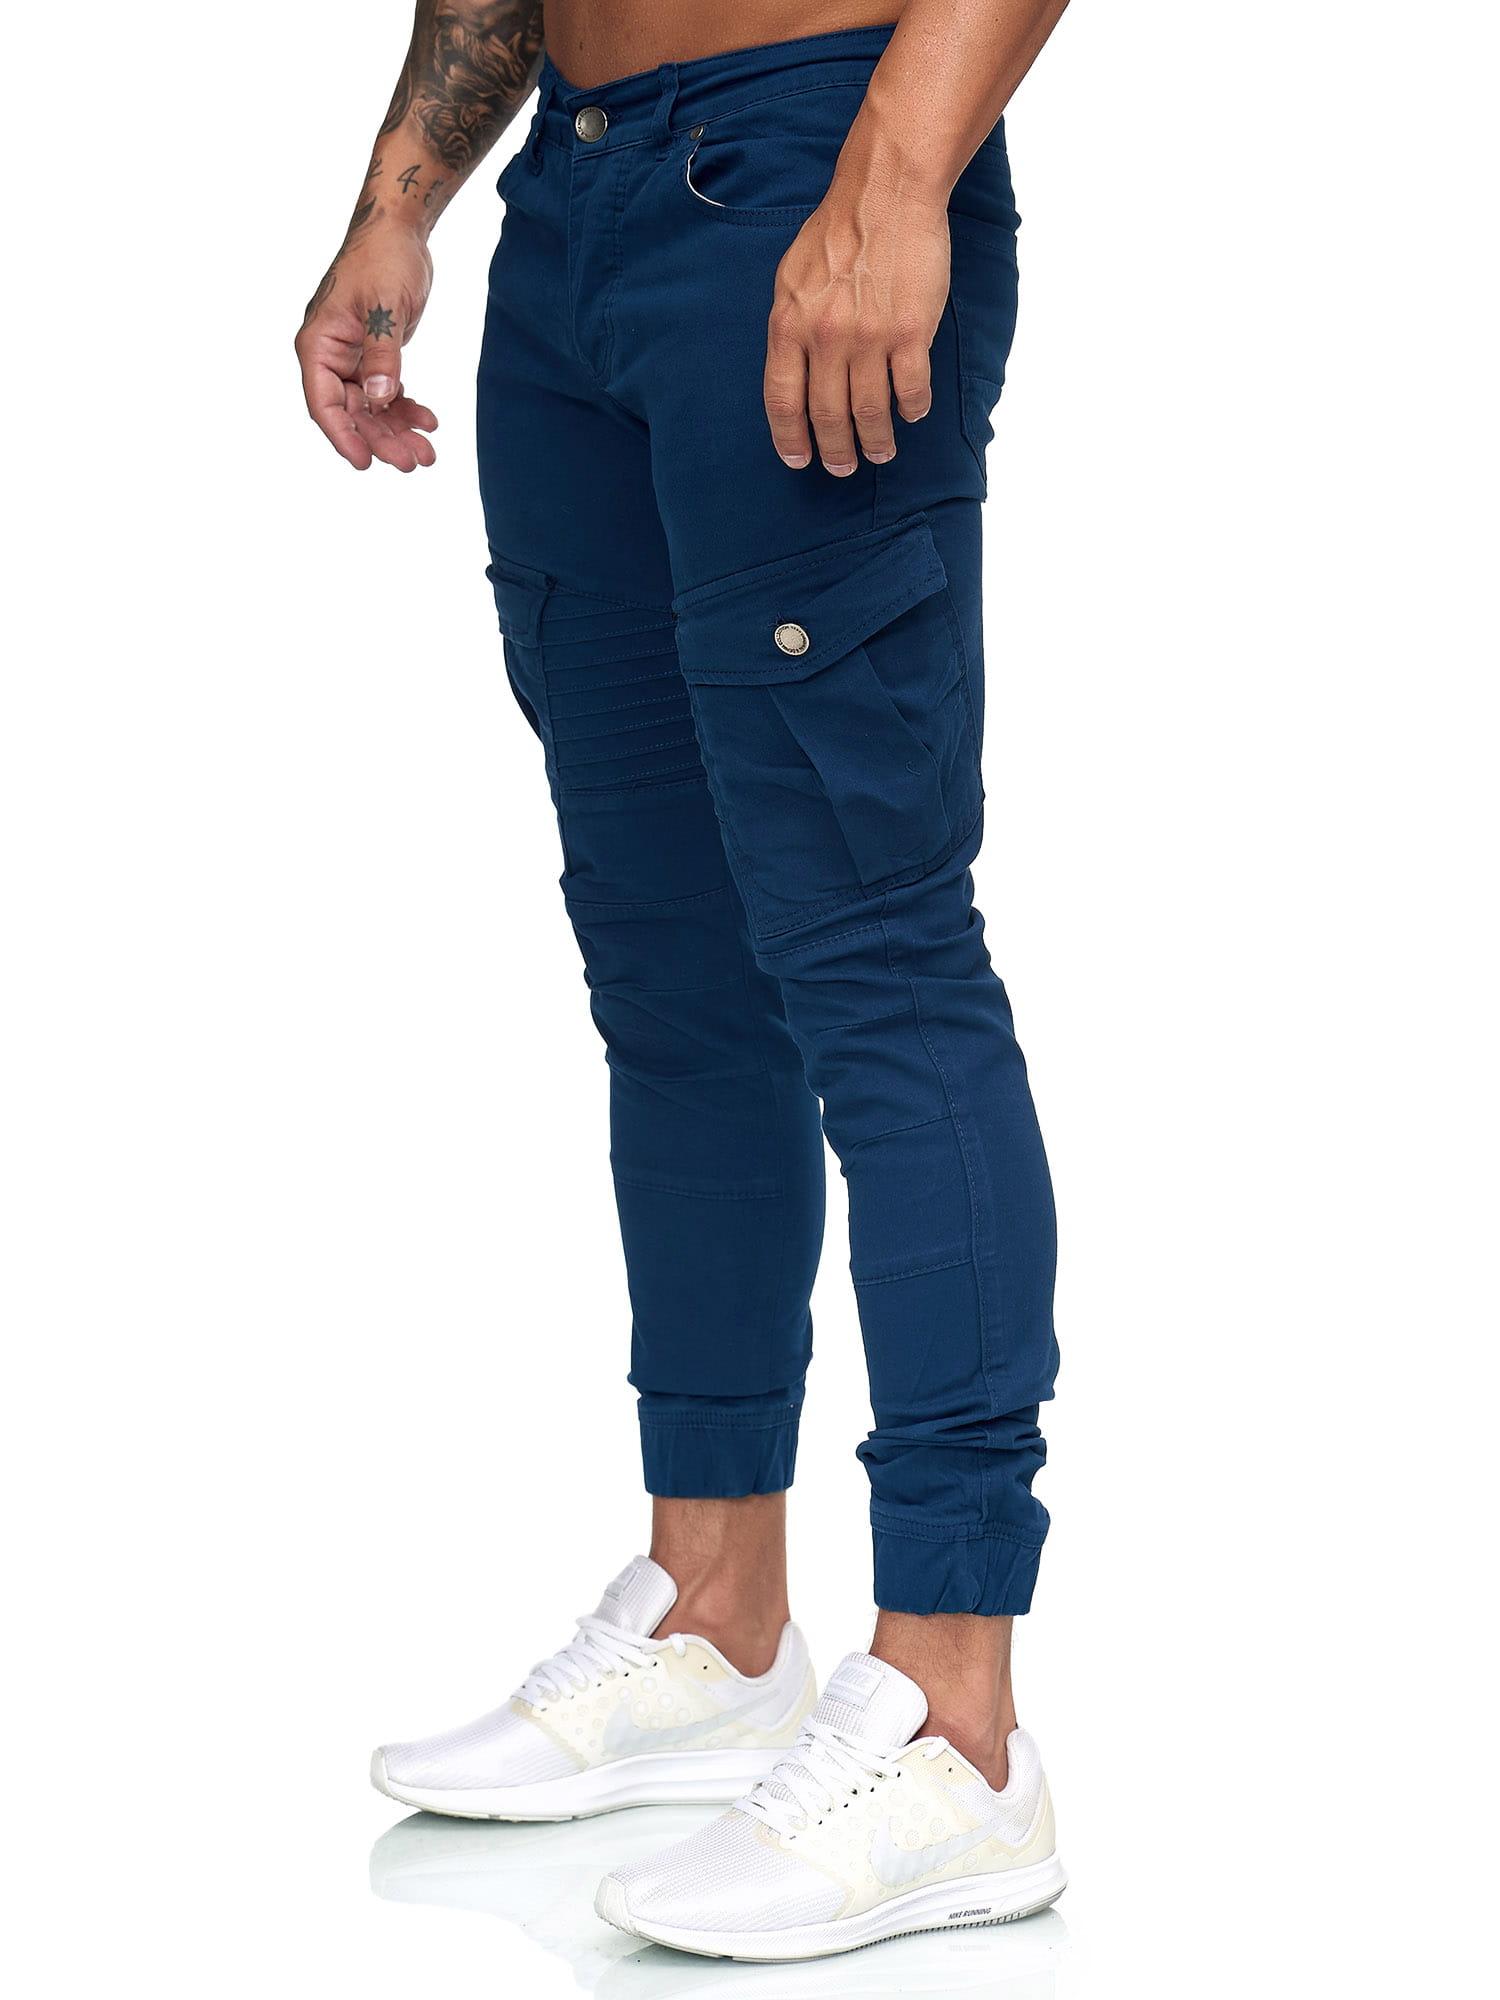 Herren Chino Hose Jeans Designer Chinohose Slim Fit Männer Skinny 1923ST